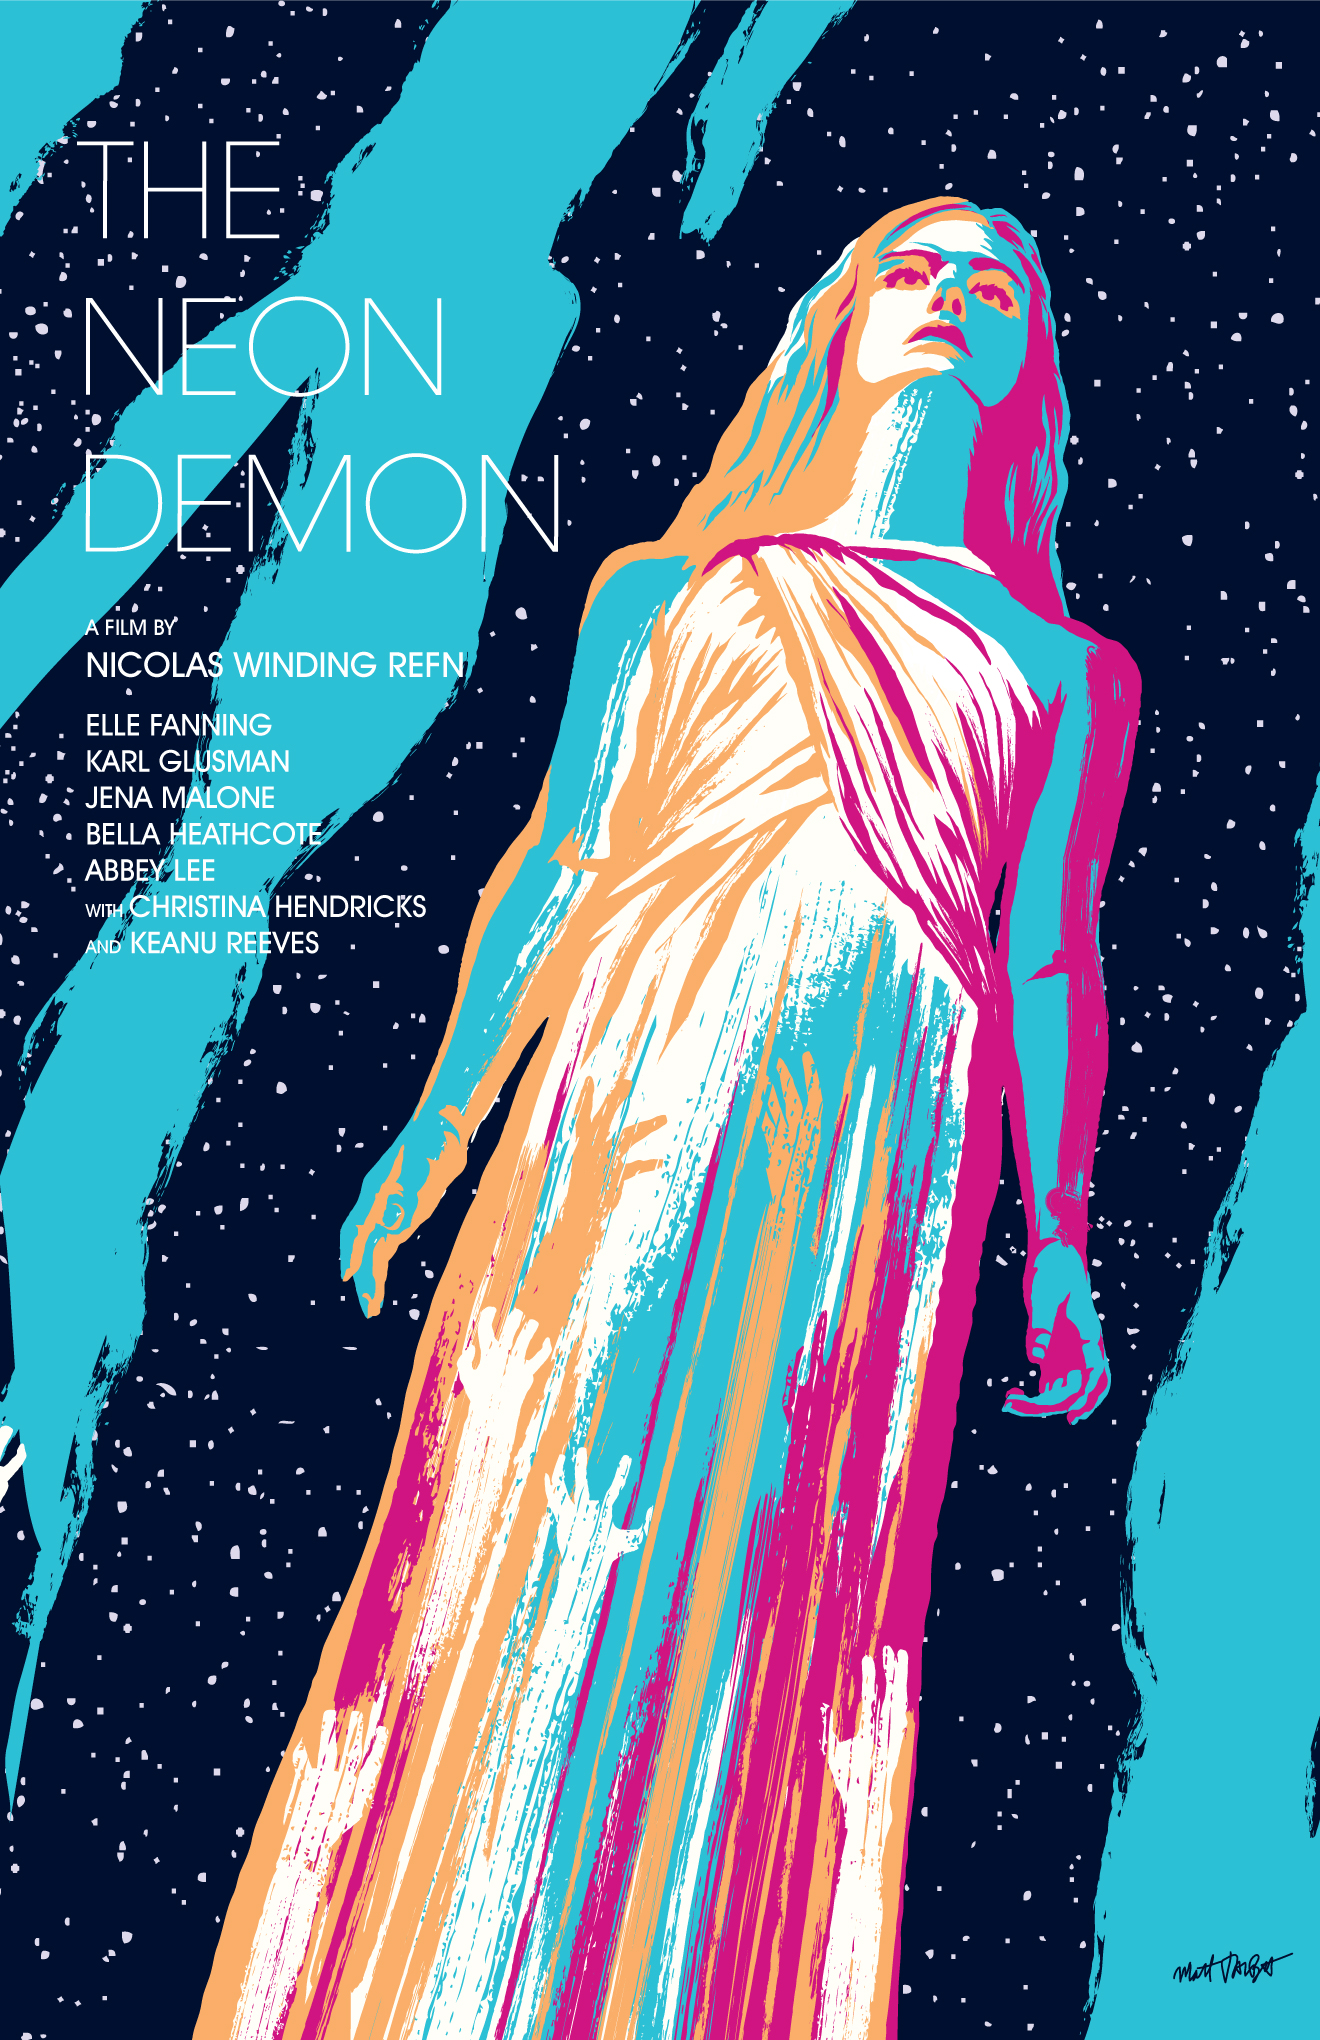 The Neon Demon poster by Matt Talbot